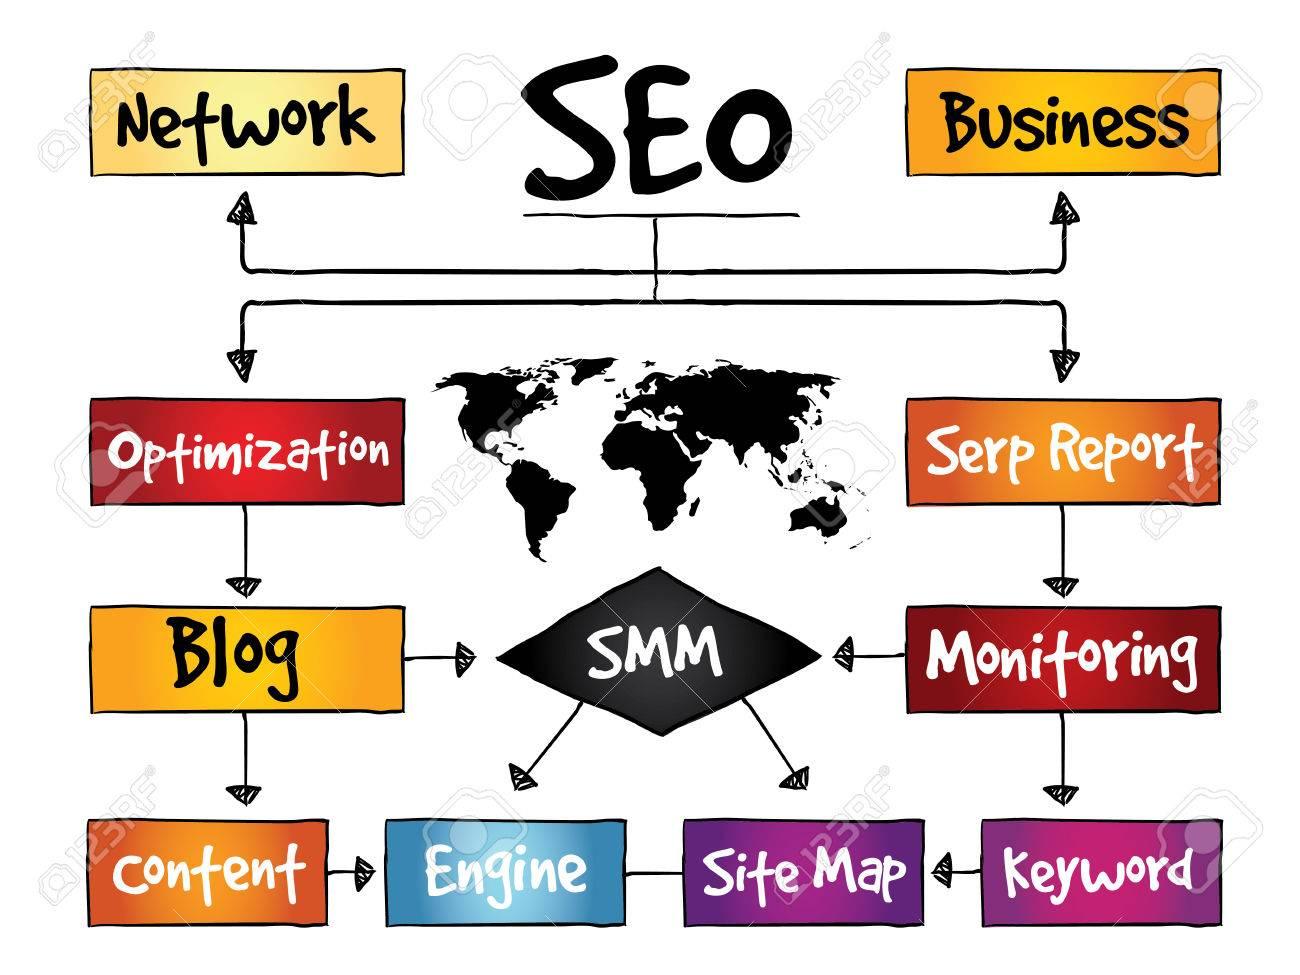 Seo Search Engine Optimization Process Flow Chart Business Diagram Concept Stock Vector 37220632